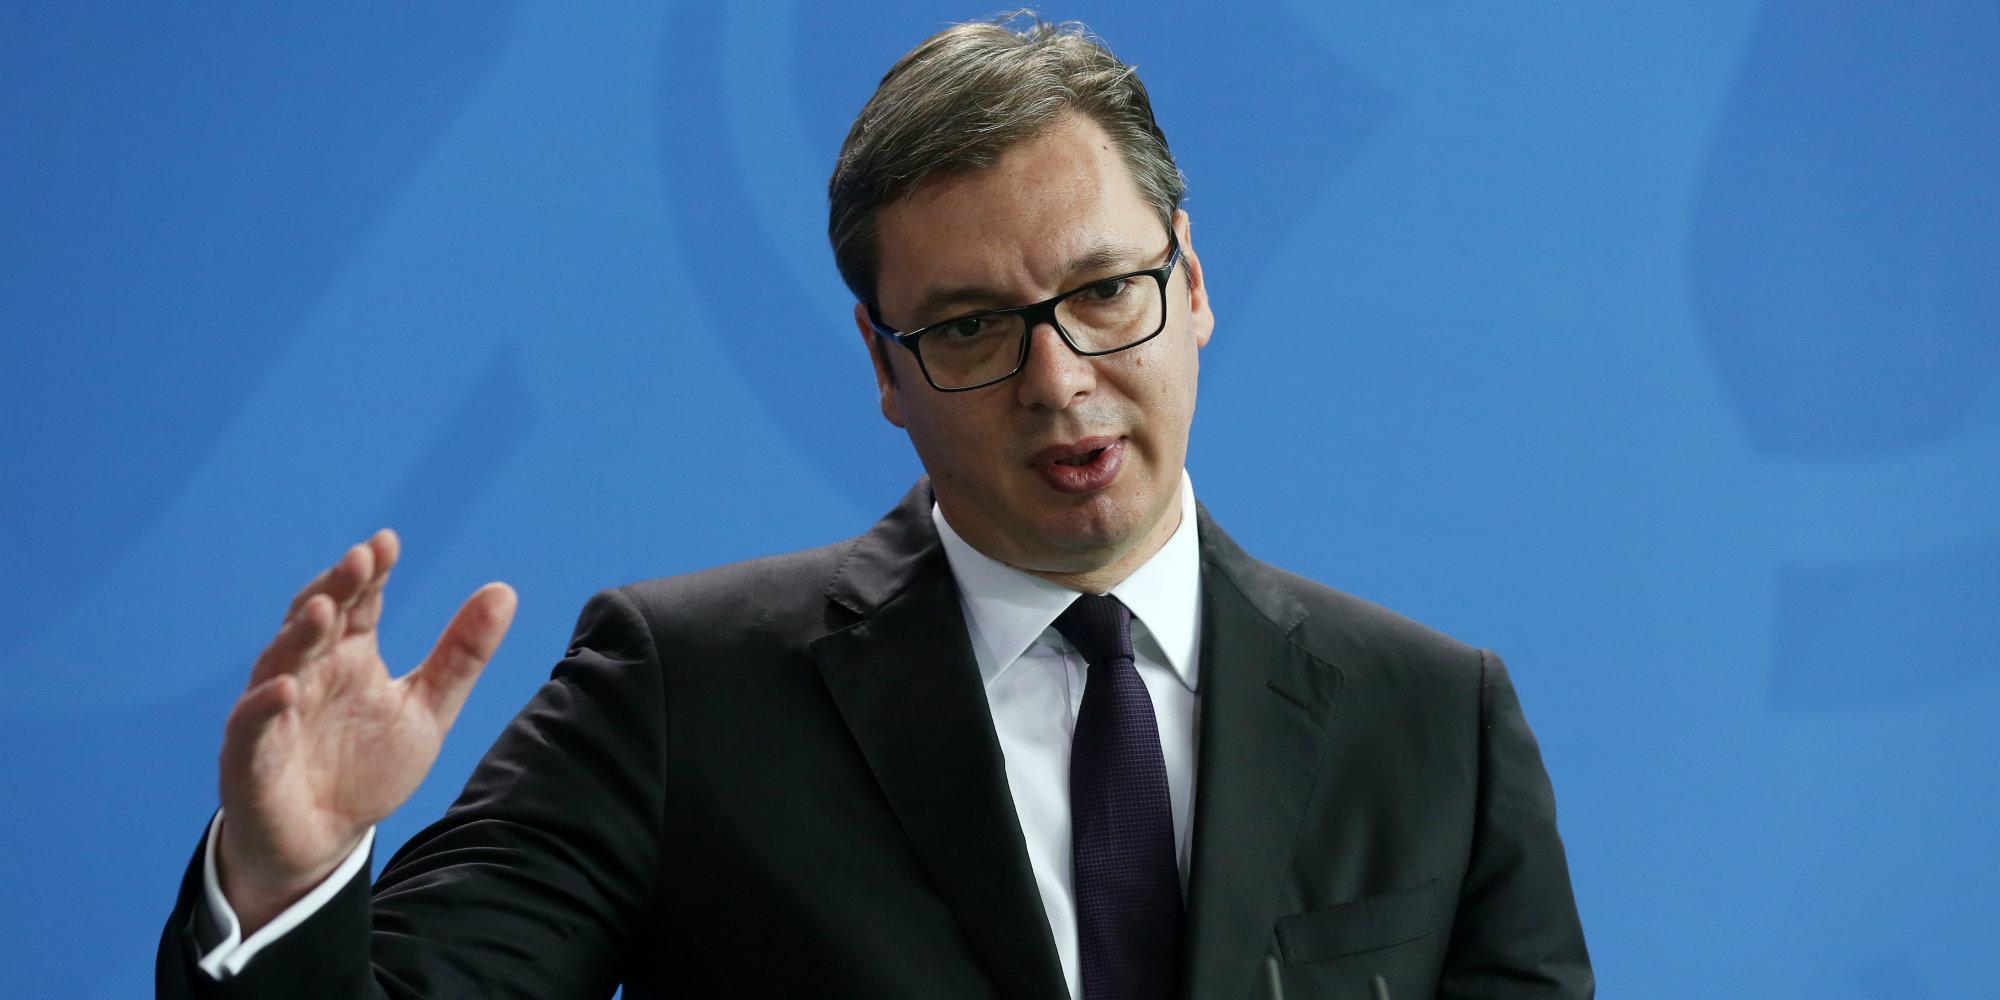 Vucic: Η ΕΕ είναι στρατηγικός στόχος της Σερβίας